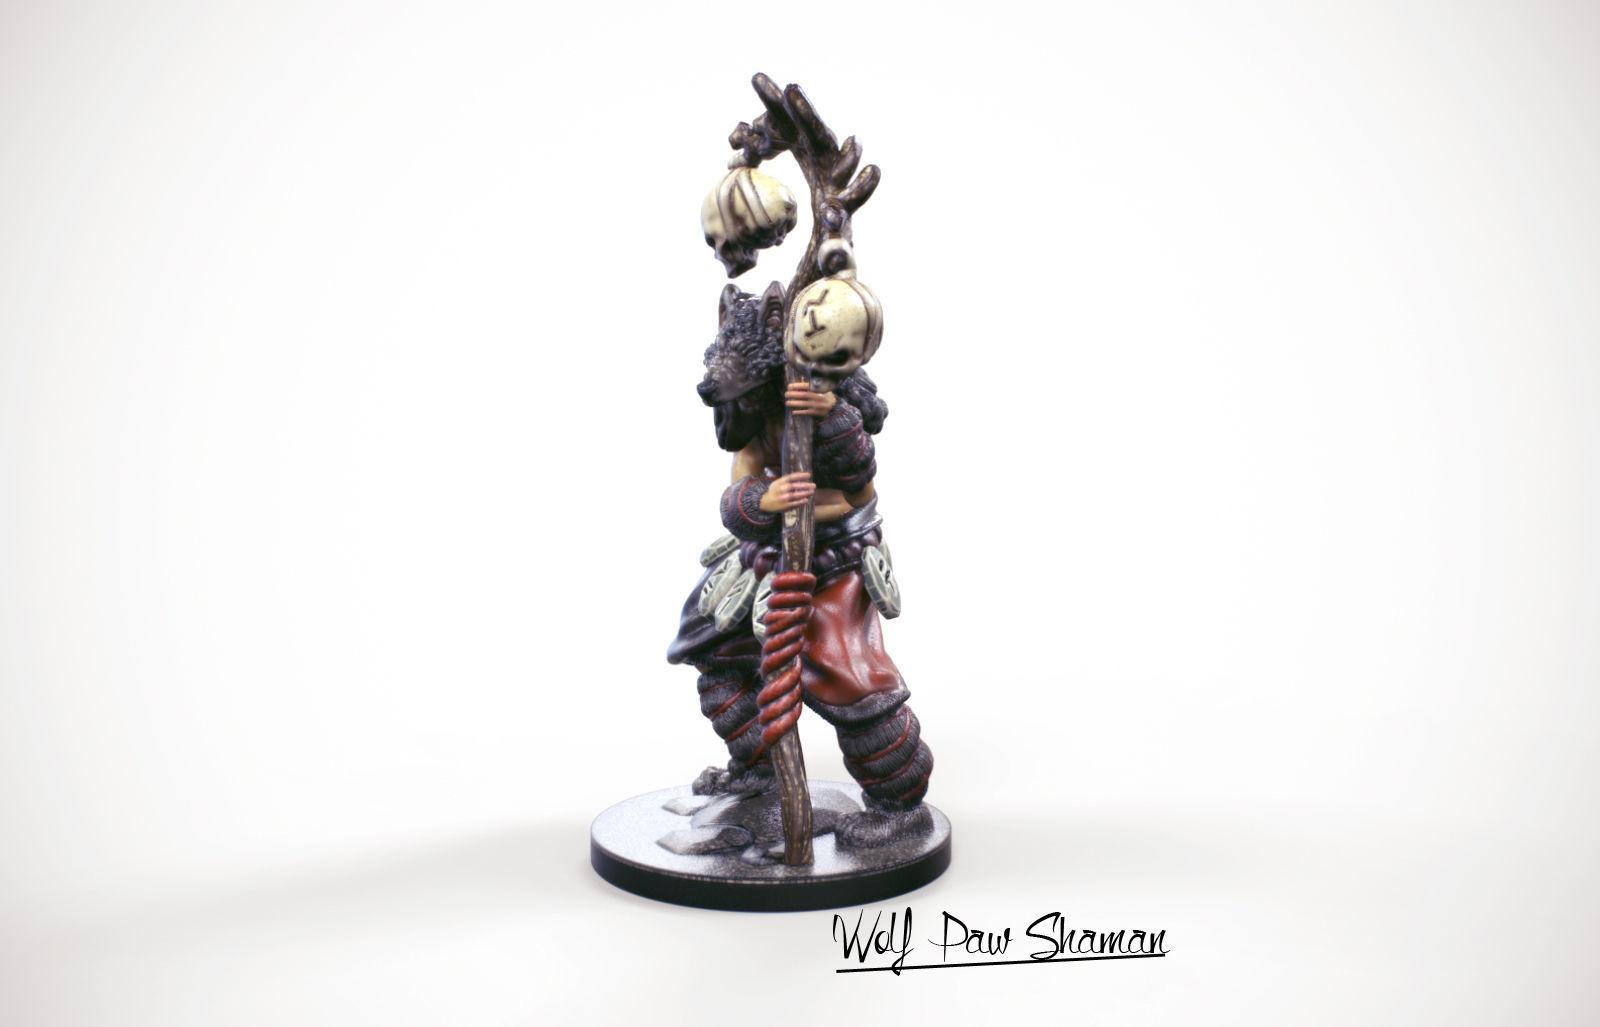 3d Printable miniature Wolf paw Shaman 32mm   3D Print Model